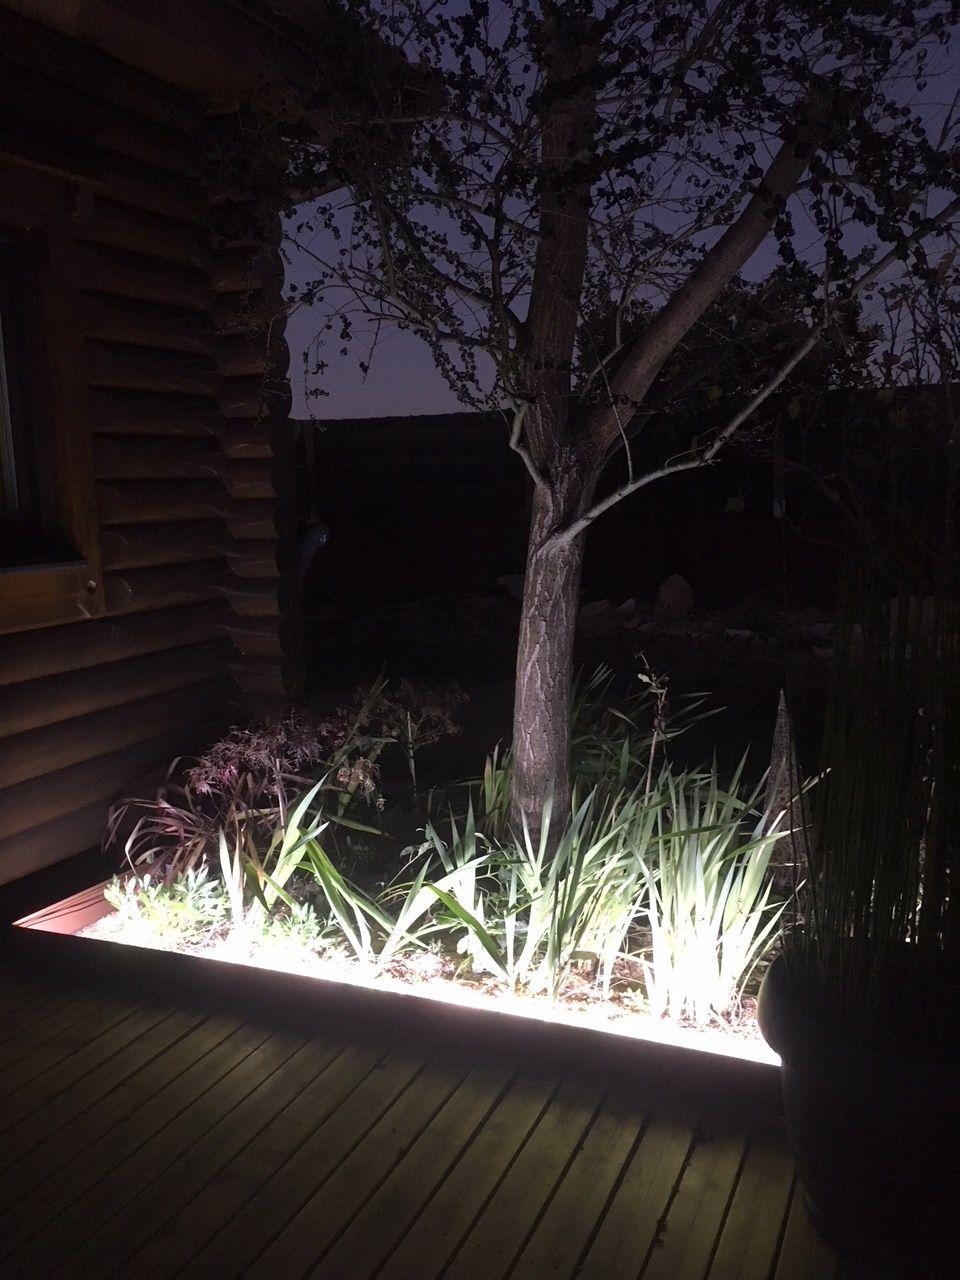 Bordure De Jardin En Aluminium Equipee D Un Eclairage Par Ruban De Led Etanche Integre Dans La Bordure 1200 Lumen Eclairage Terrasse Bordure De Jardin Jardins